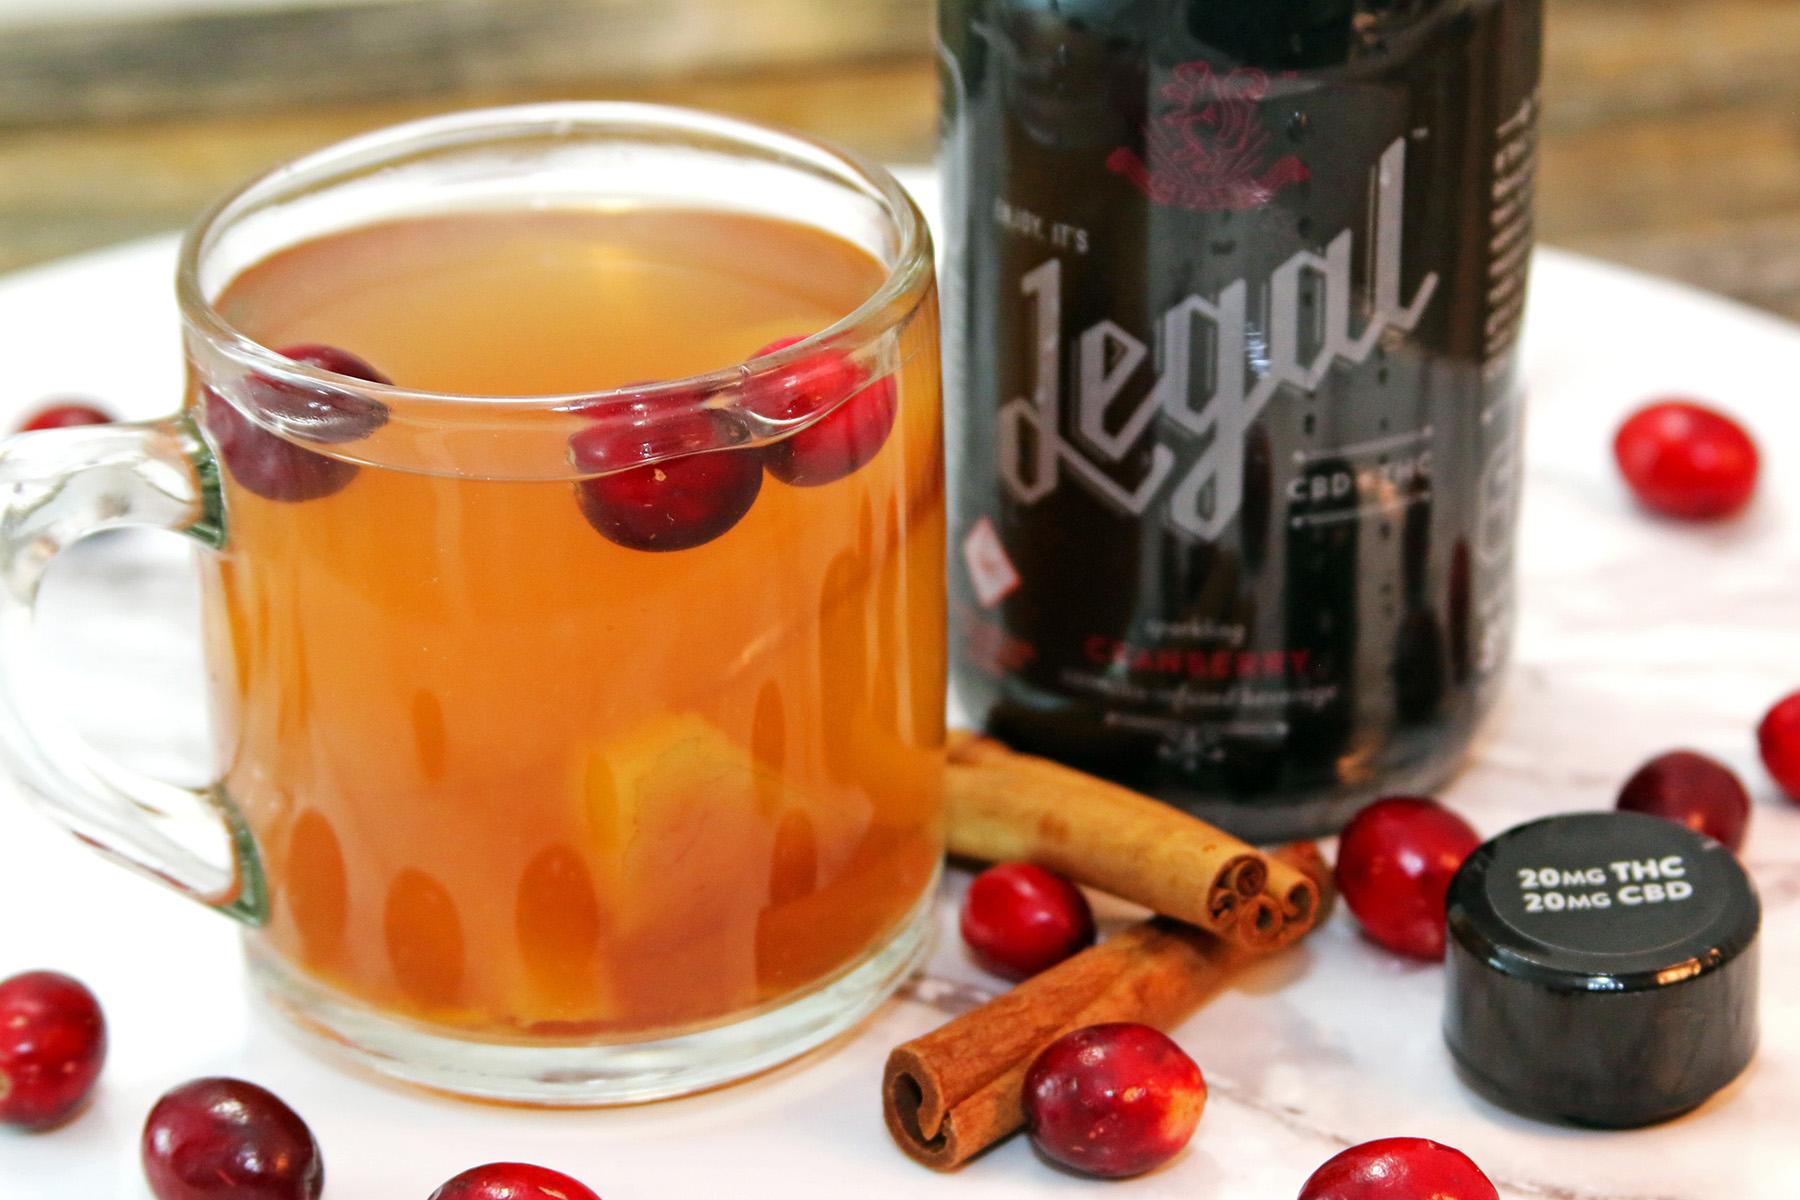 Cranberry Legal - Apple Cider WEB.jpg